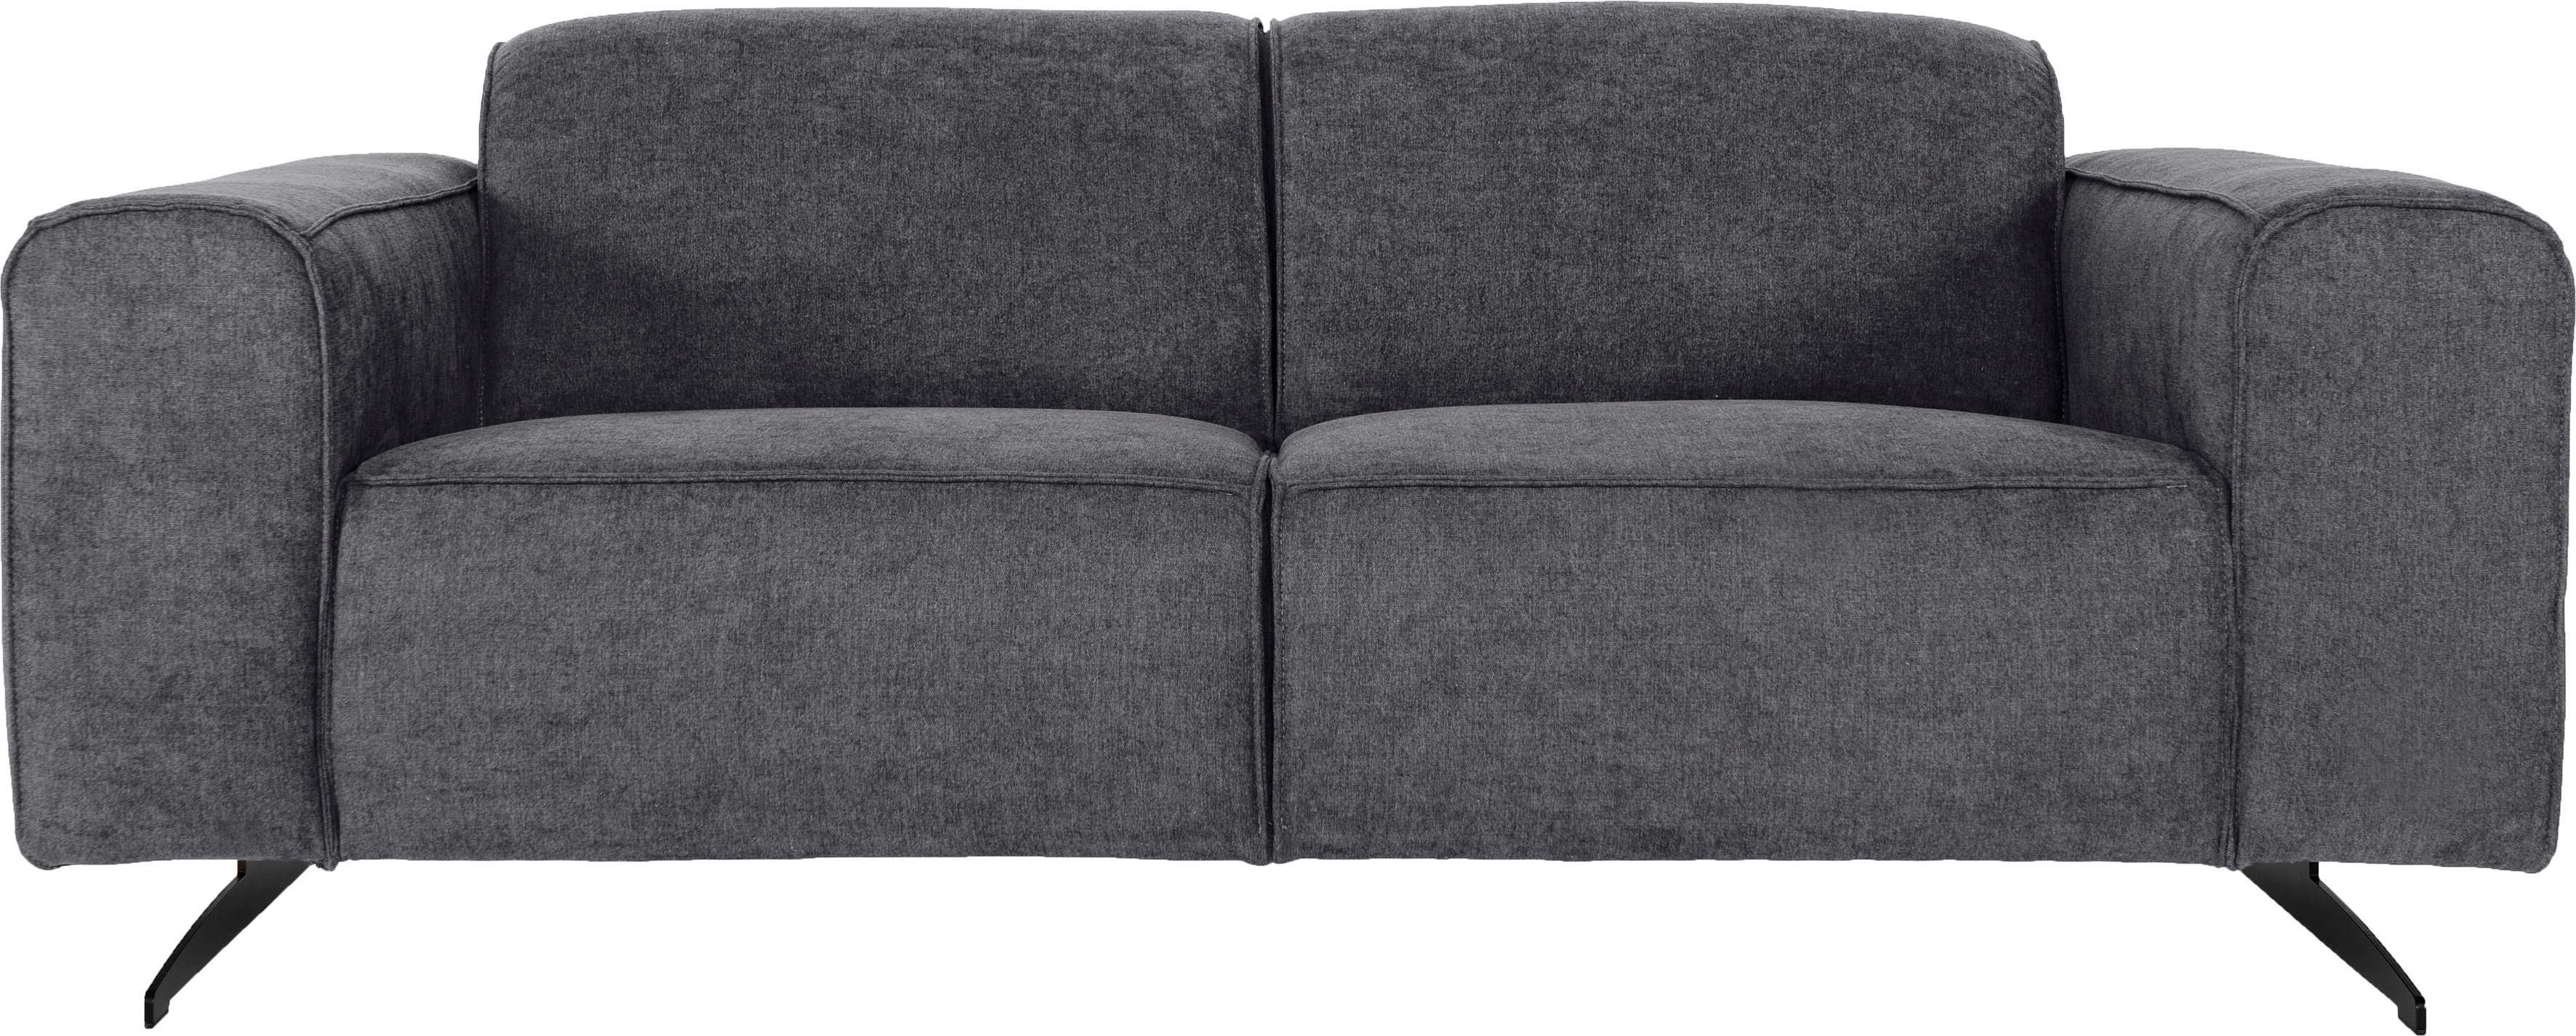 Big Sofa Xxl Couch L Form Afrika Ecksofa Hudson Ii Amerikanische Sofas Sofa Set Online Shopping Tamilnadu Schlafsofa Kaufen Hambu Ecksofas Ecksofa Sofa